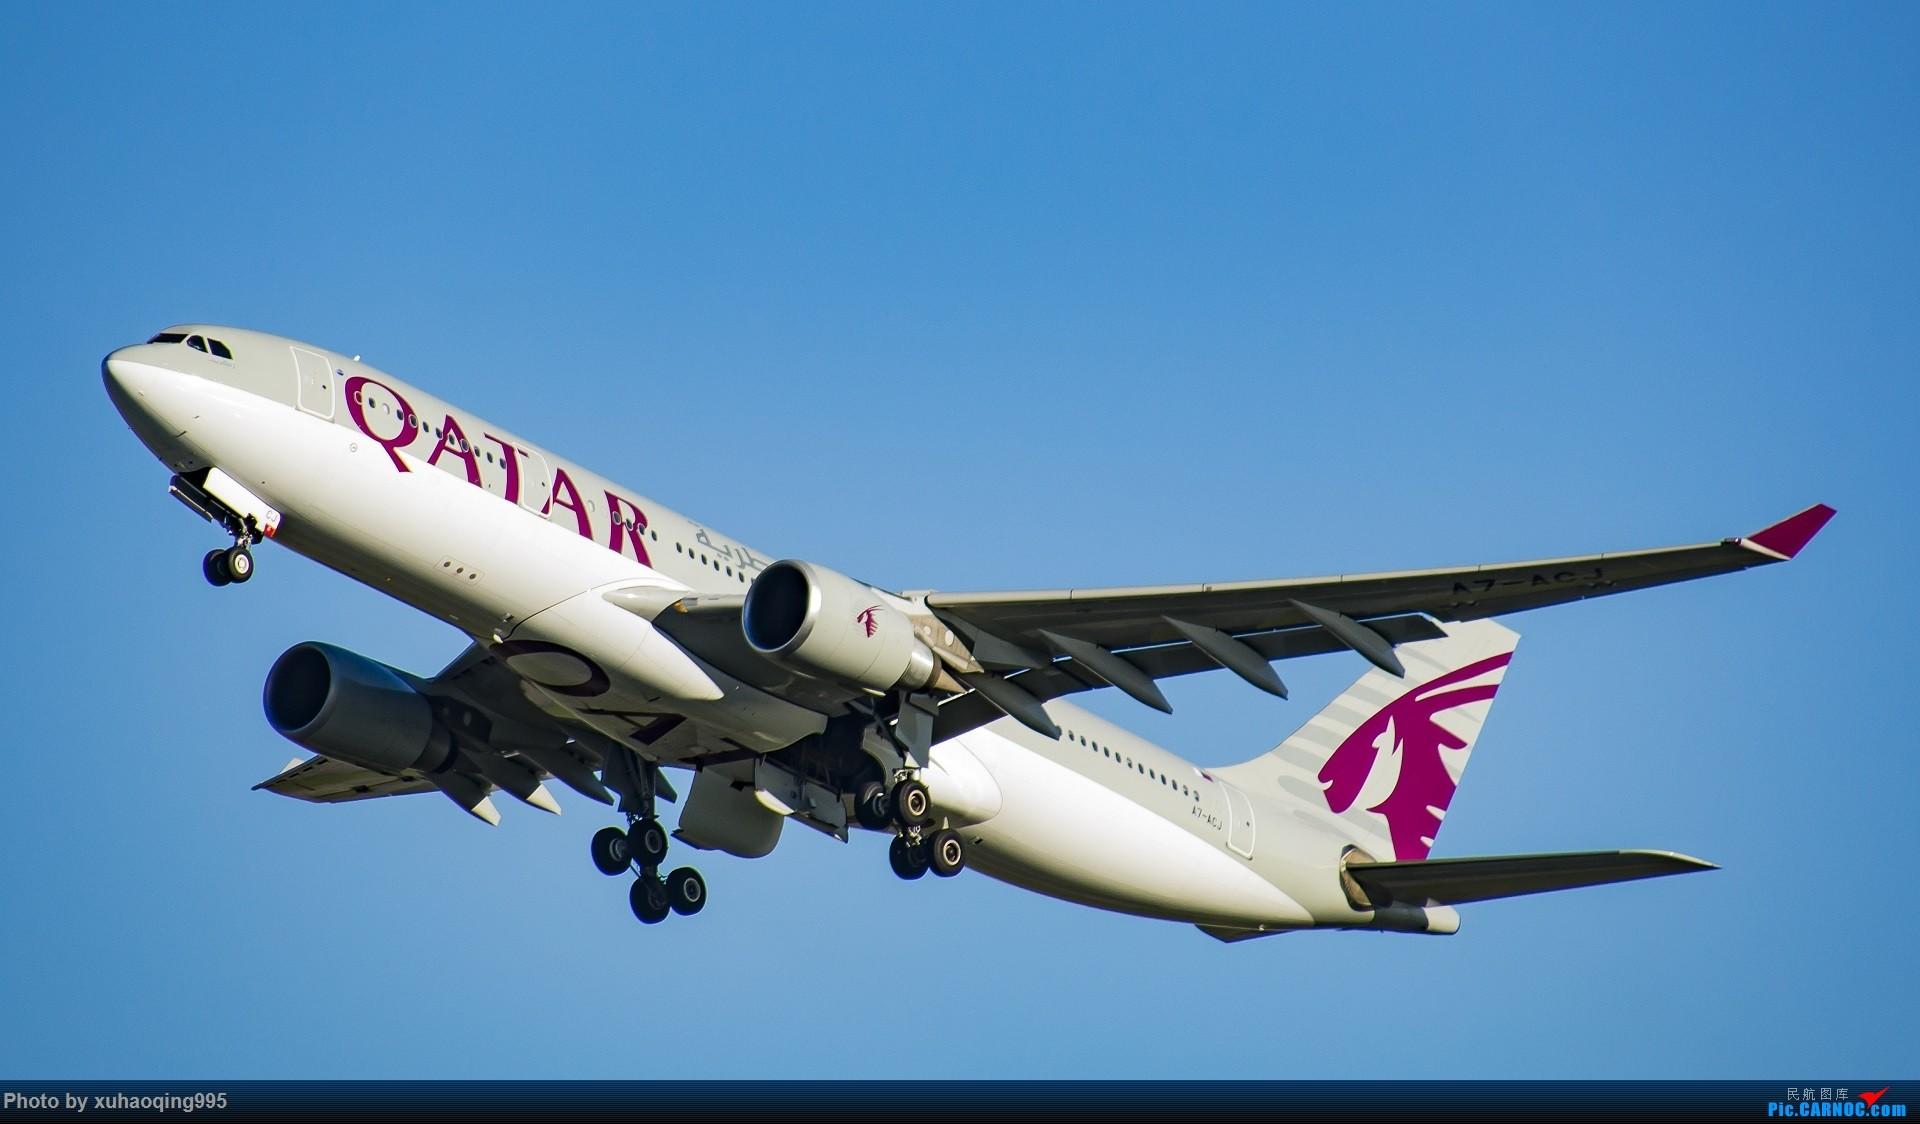 Re:[原创]罗马机场(FCO)拍机 AIRBUS A330-200 A7-ACJ 意大利菲乌米奇诺机场